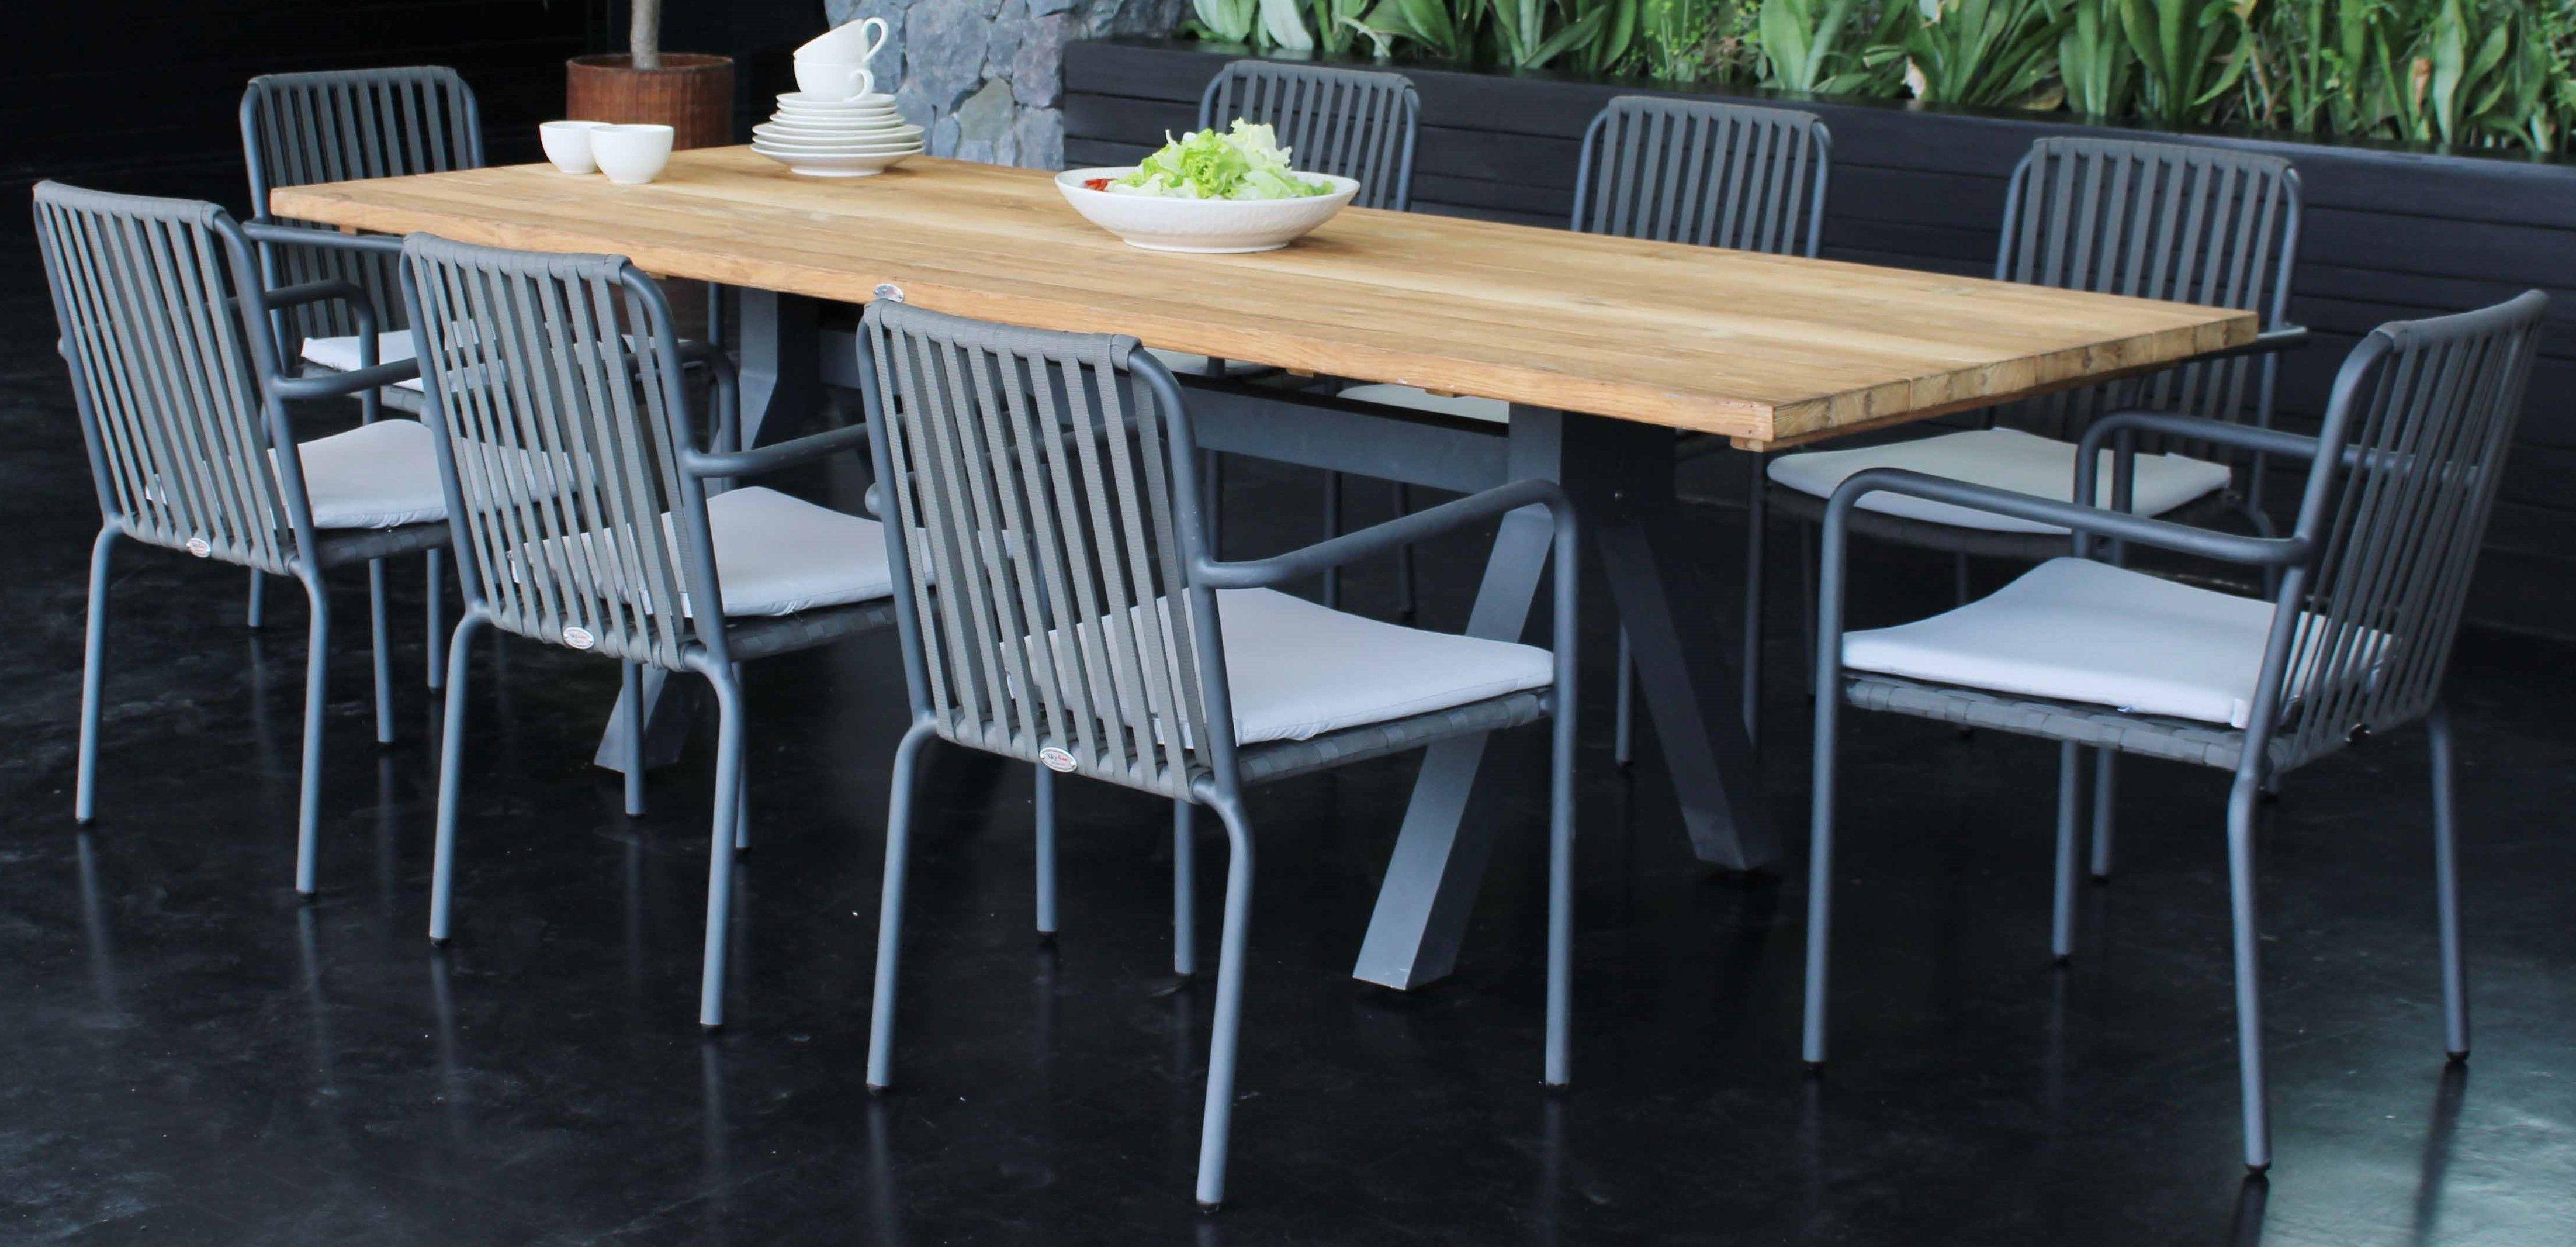 Alaska Outdoor 6 Seat Rectangular Dining Table In Dark Grey With